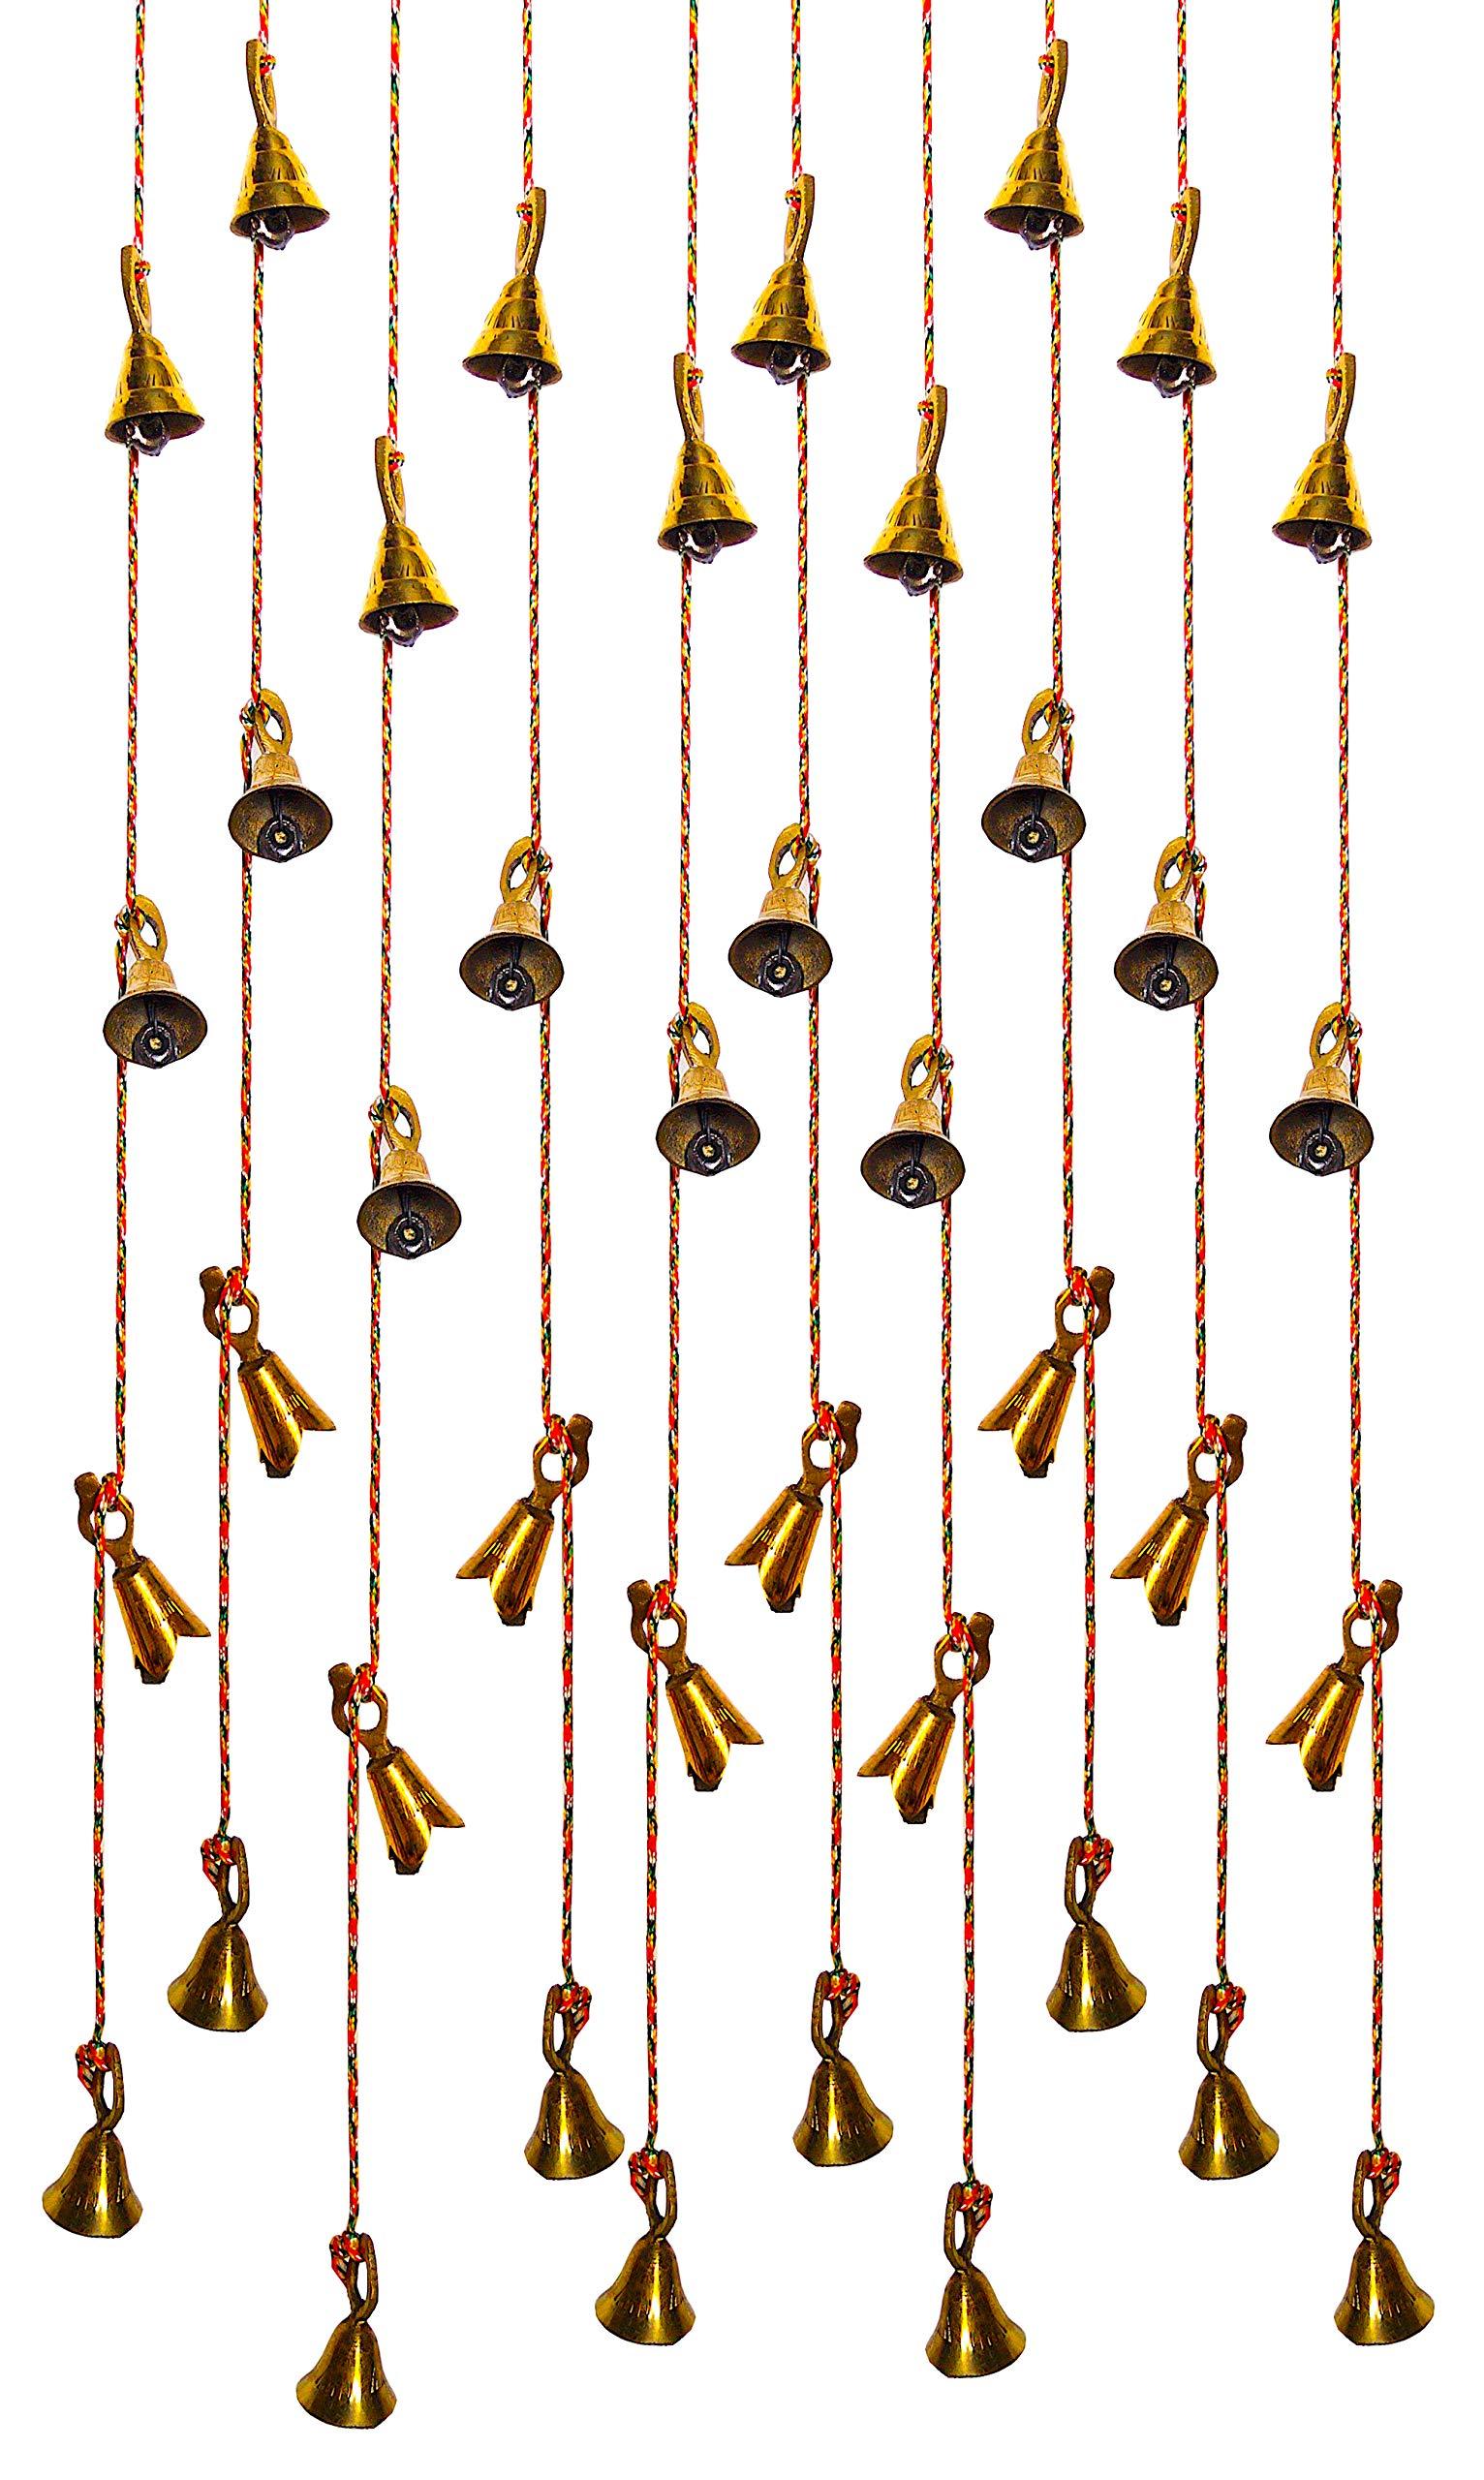 Shalimar's Showroom String of Bells Set of 12 Brass Hanging Door Bells Decorative String Indian Style Fair Trade Wall Hanging Bells (37'' String) by Shalimar's Showroom